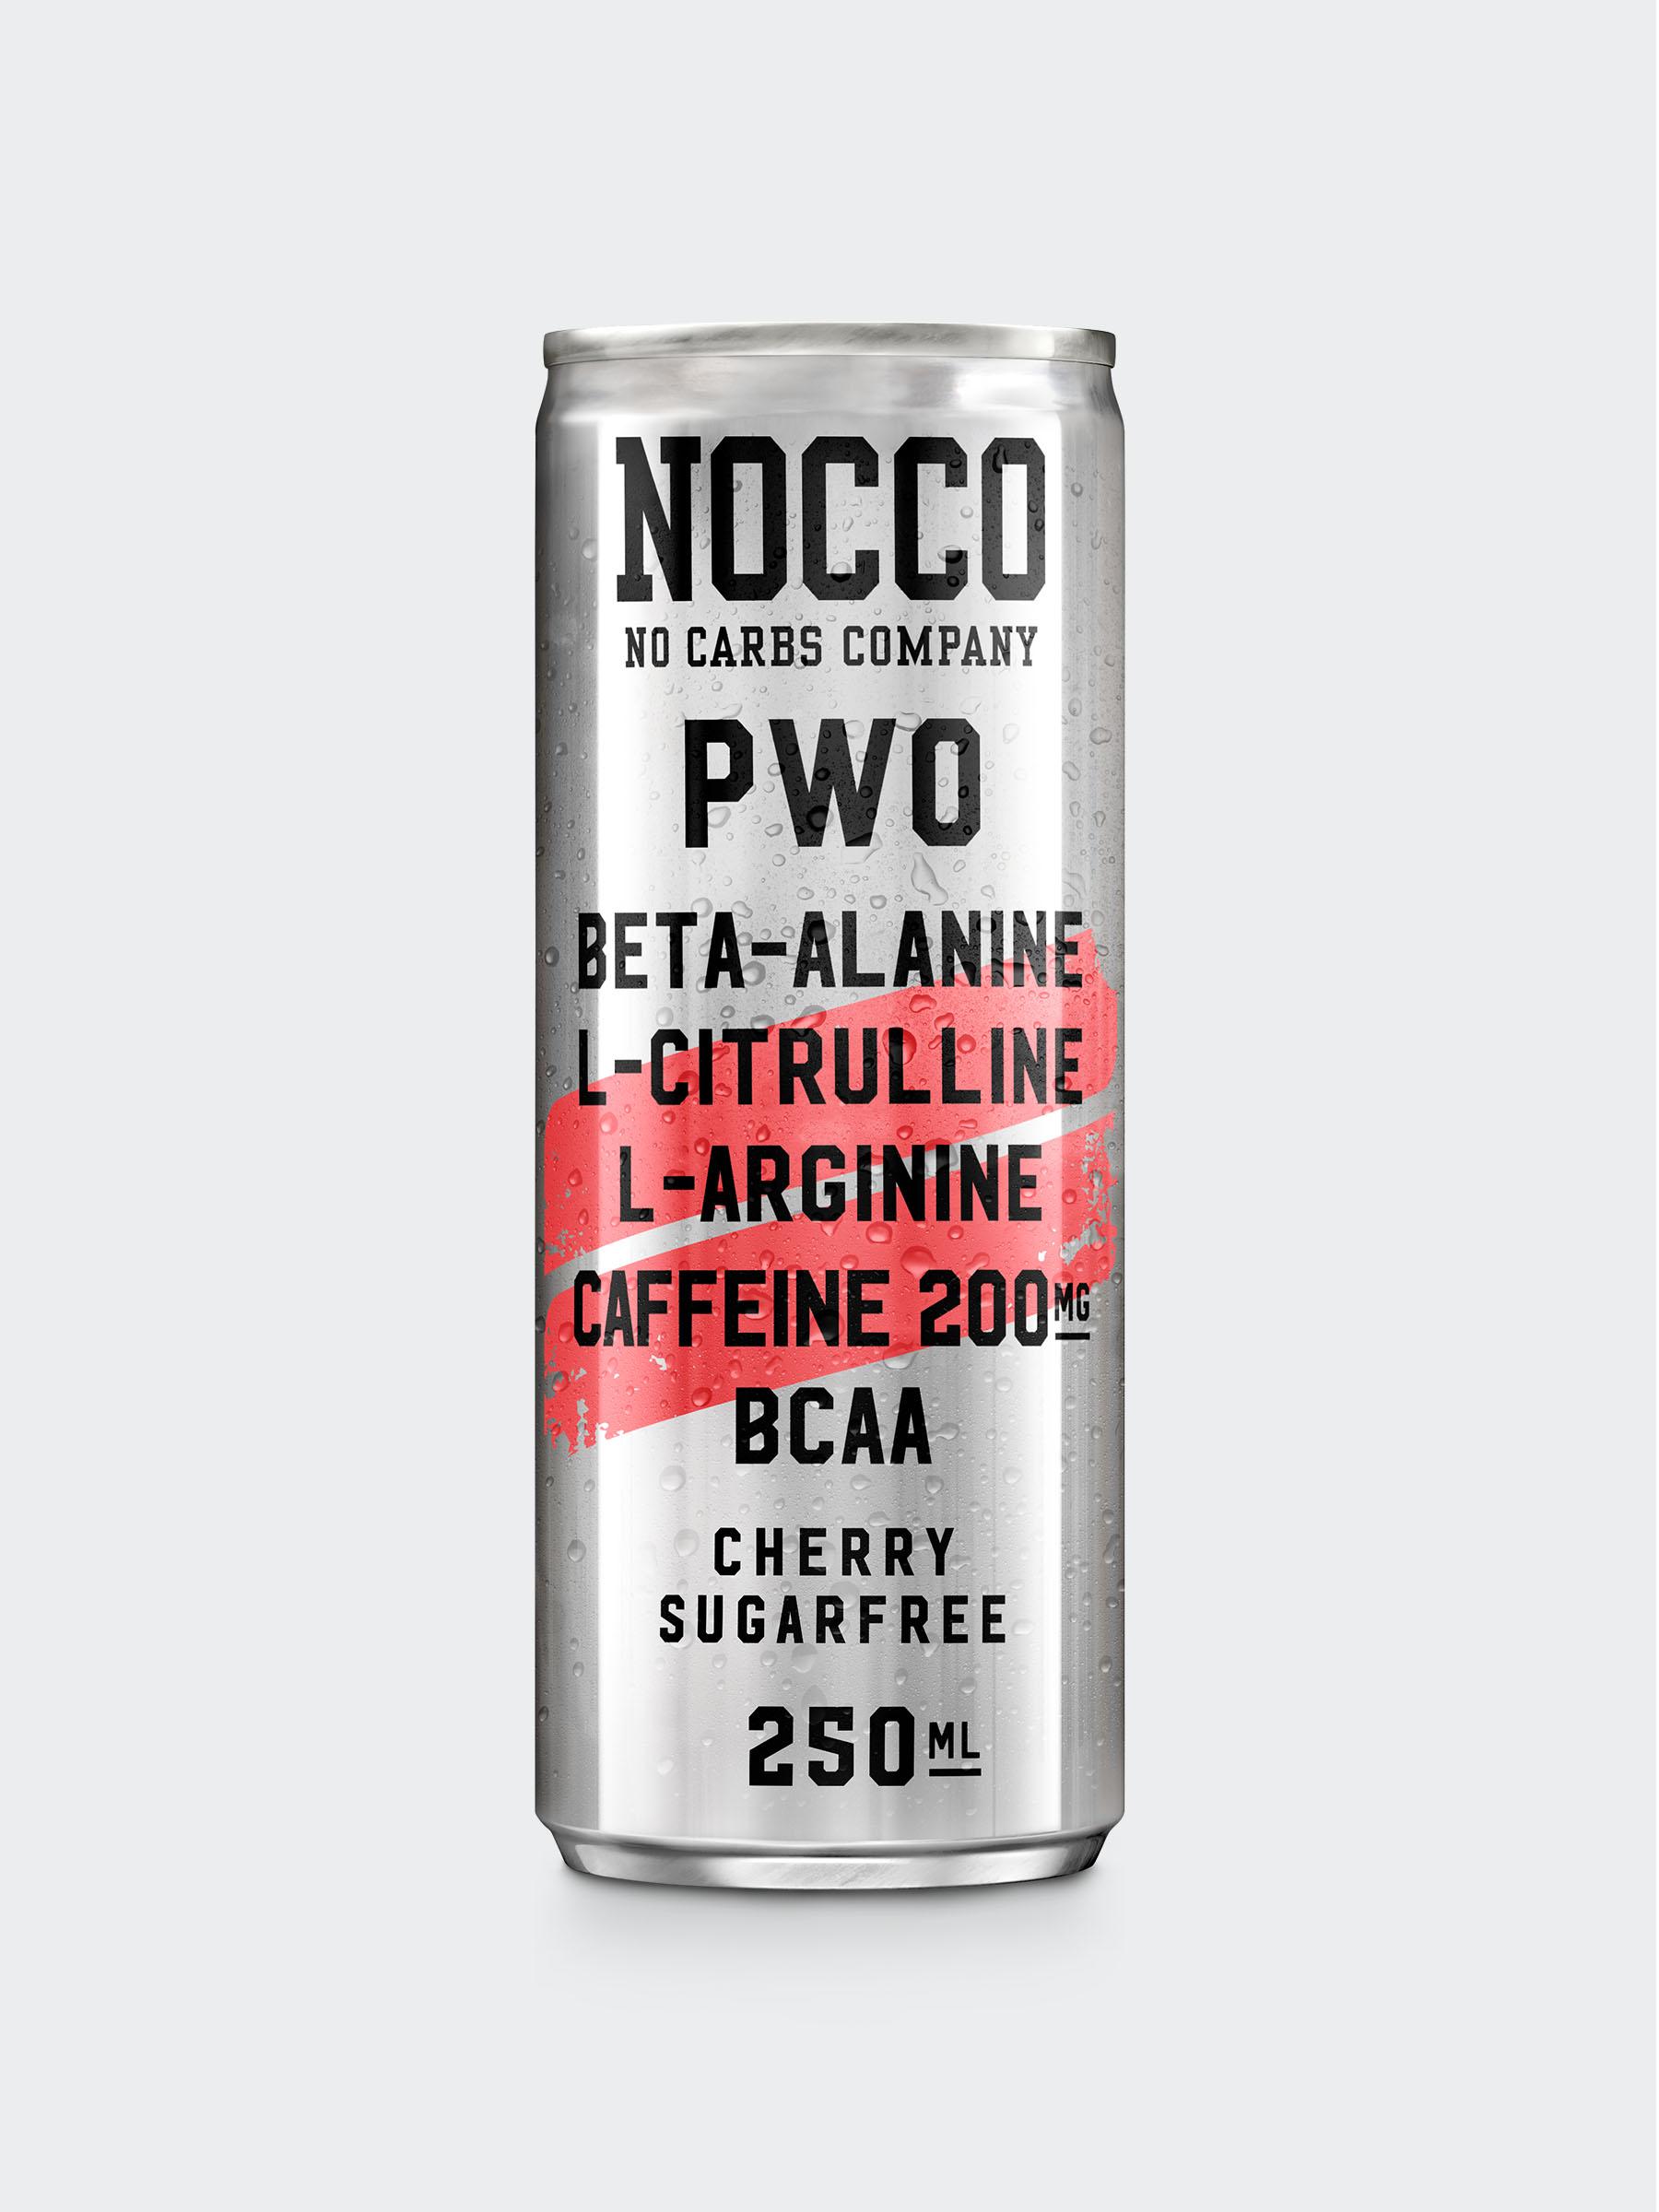 NOCCO PWO Cherry